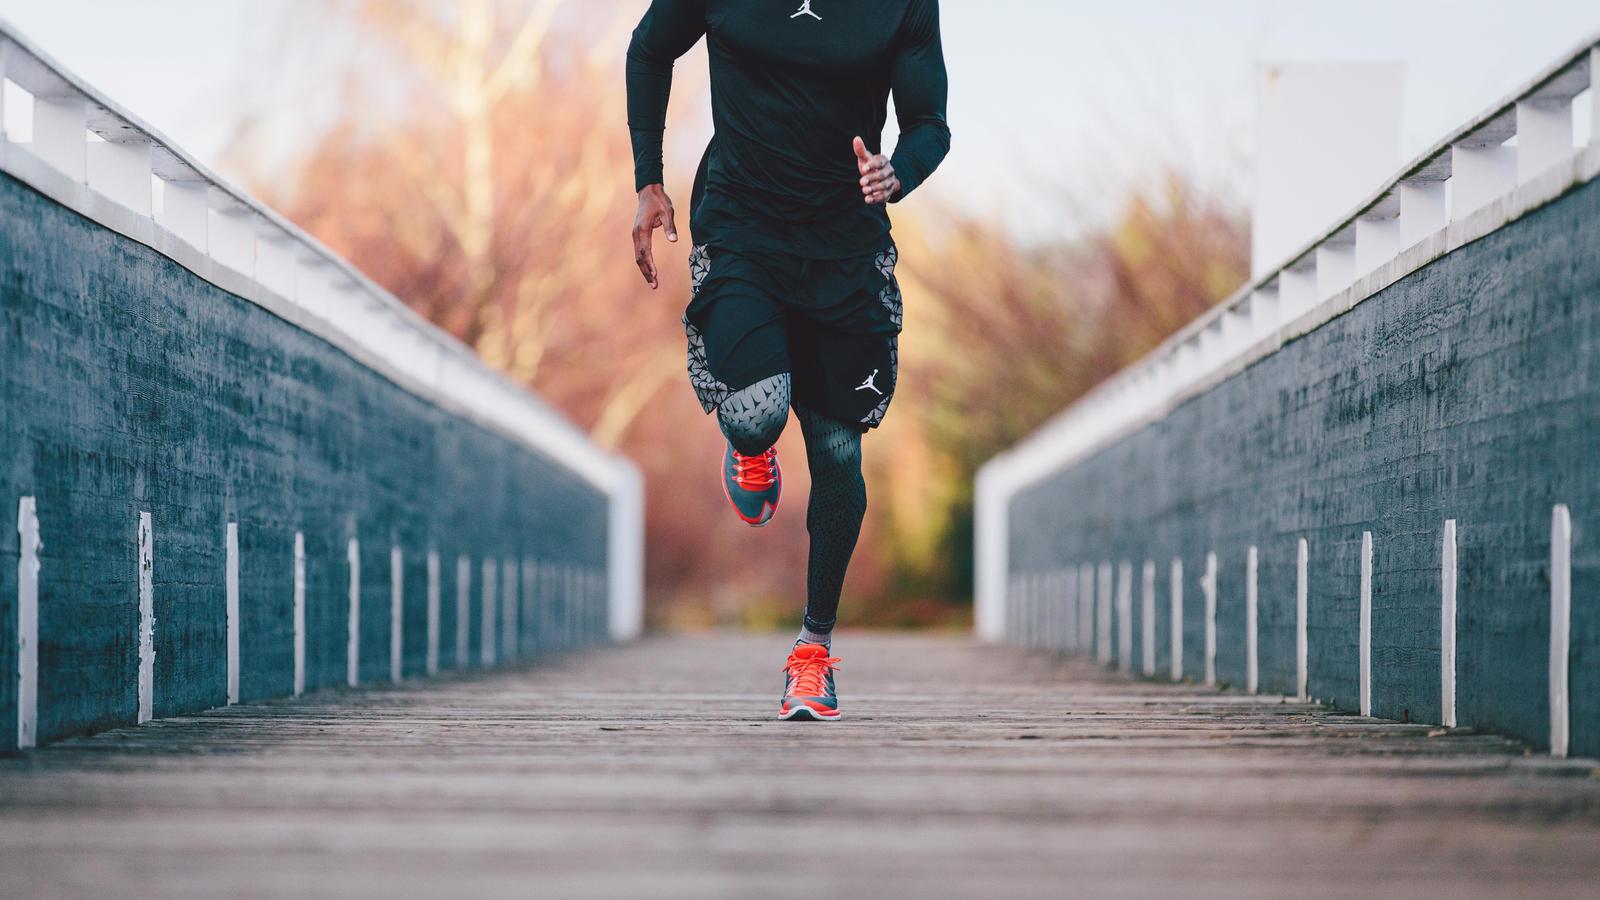 Jordan Flight Runner 2: Bringing Jordan Brand Style To